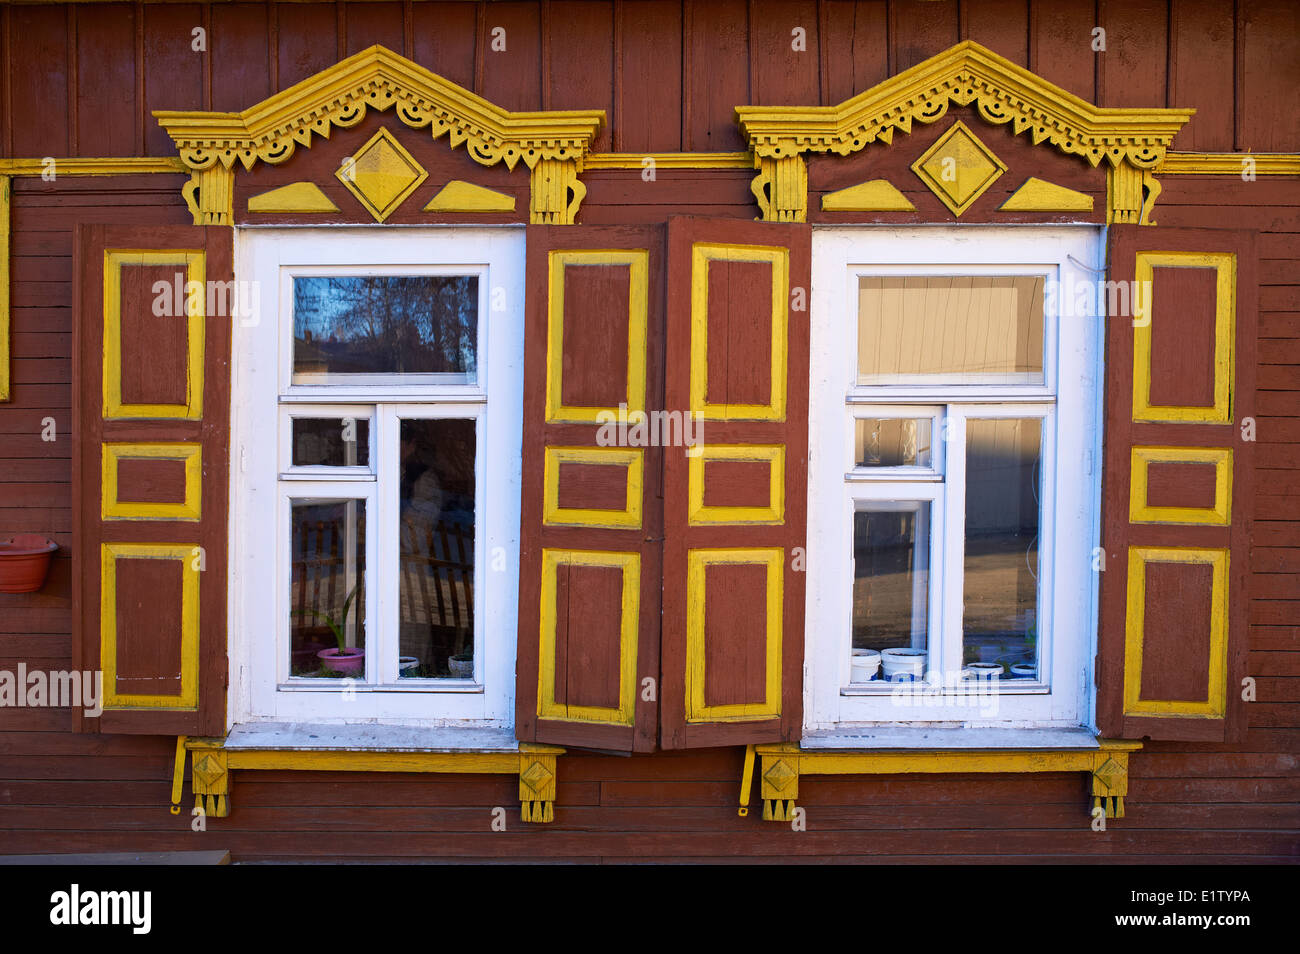 Rusia, Siberia, Irkutsk, arquitectura de madera Imagen De Stock